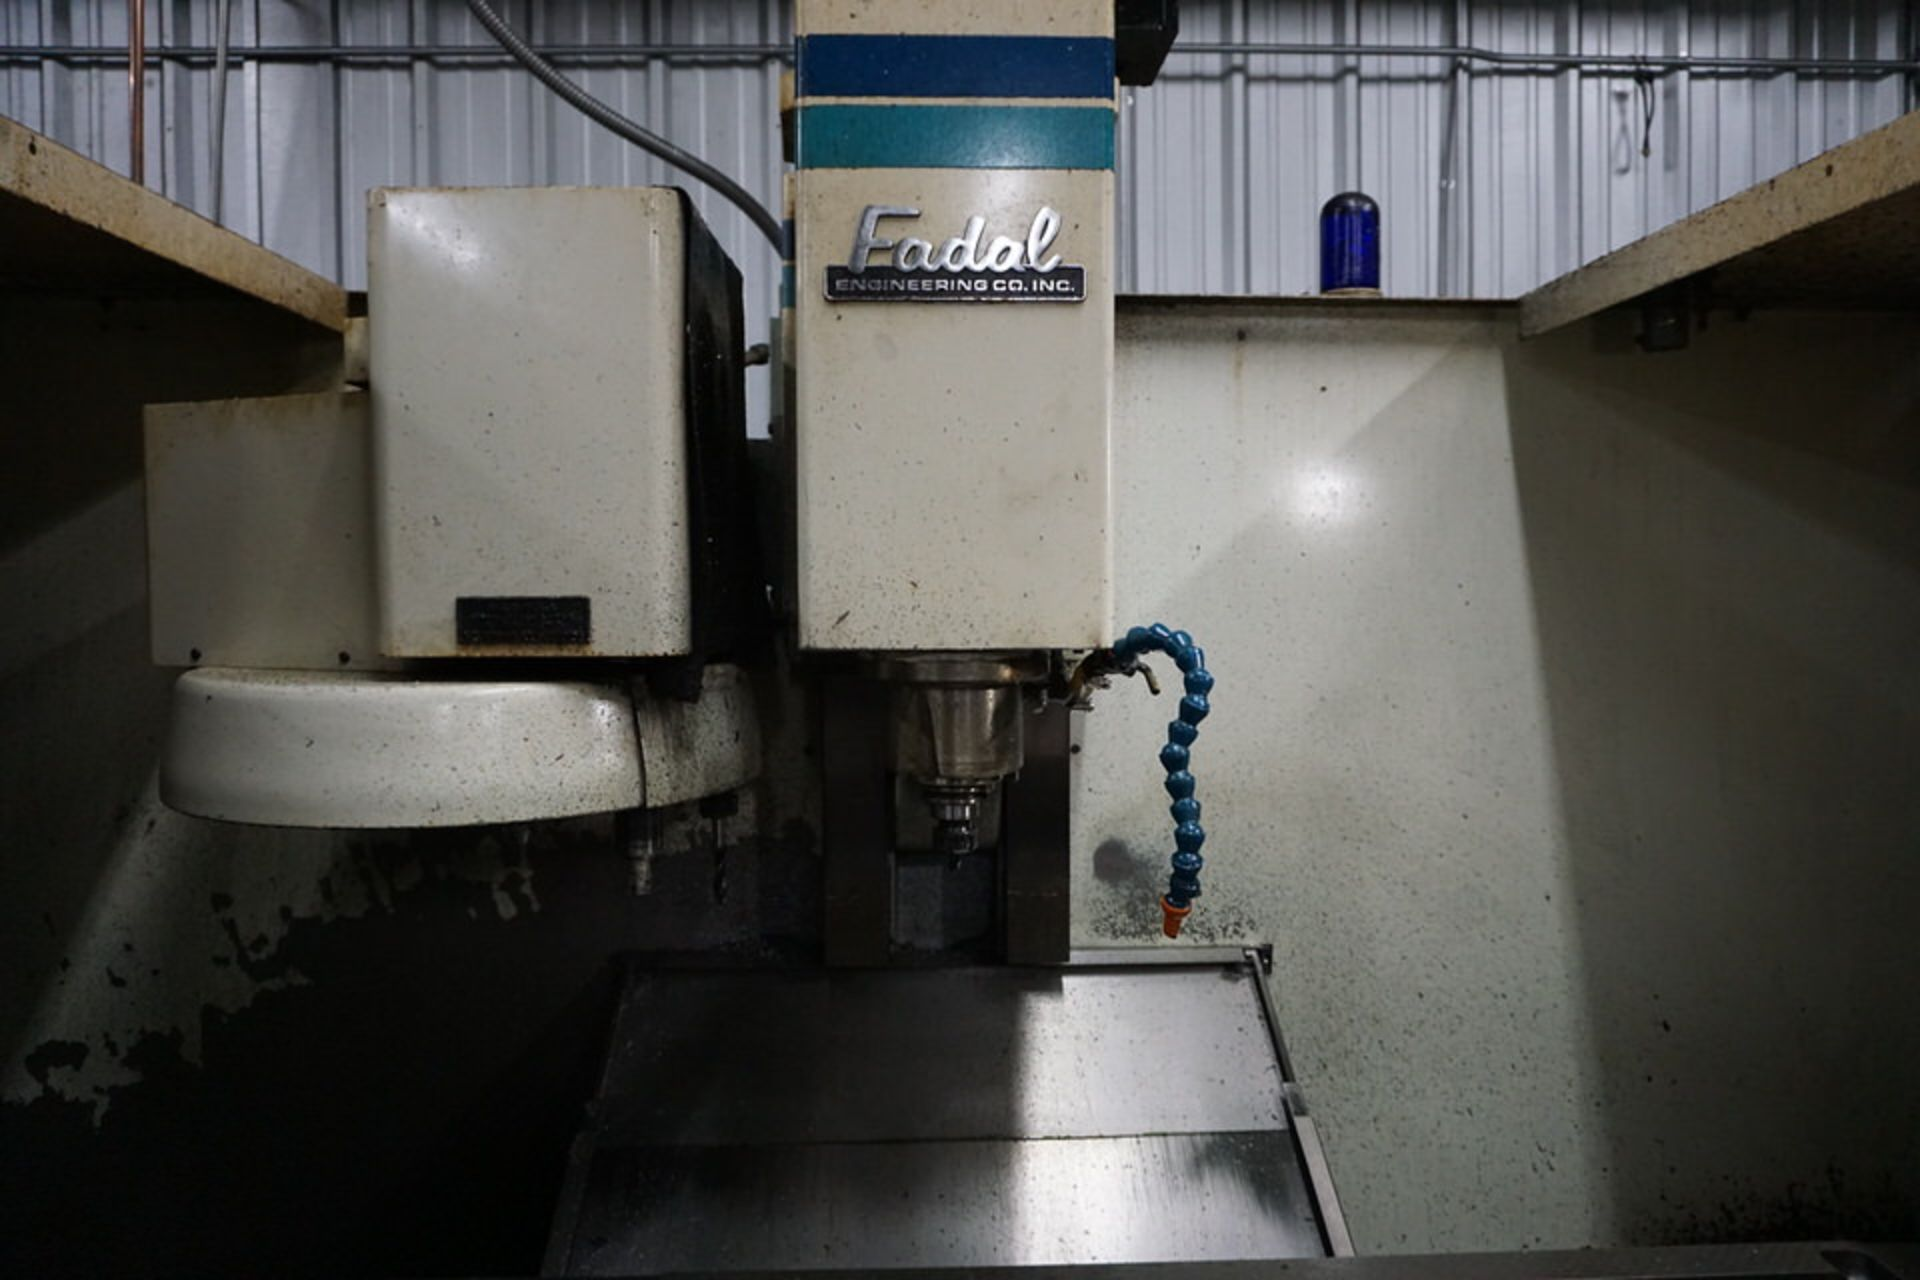 FADAL 4020 VERTICAL MACHINING CENTER W/ FADAL CNC 88 CONTROL - Image 2 of 8